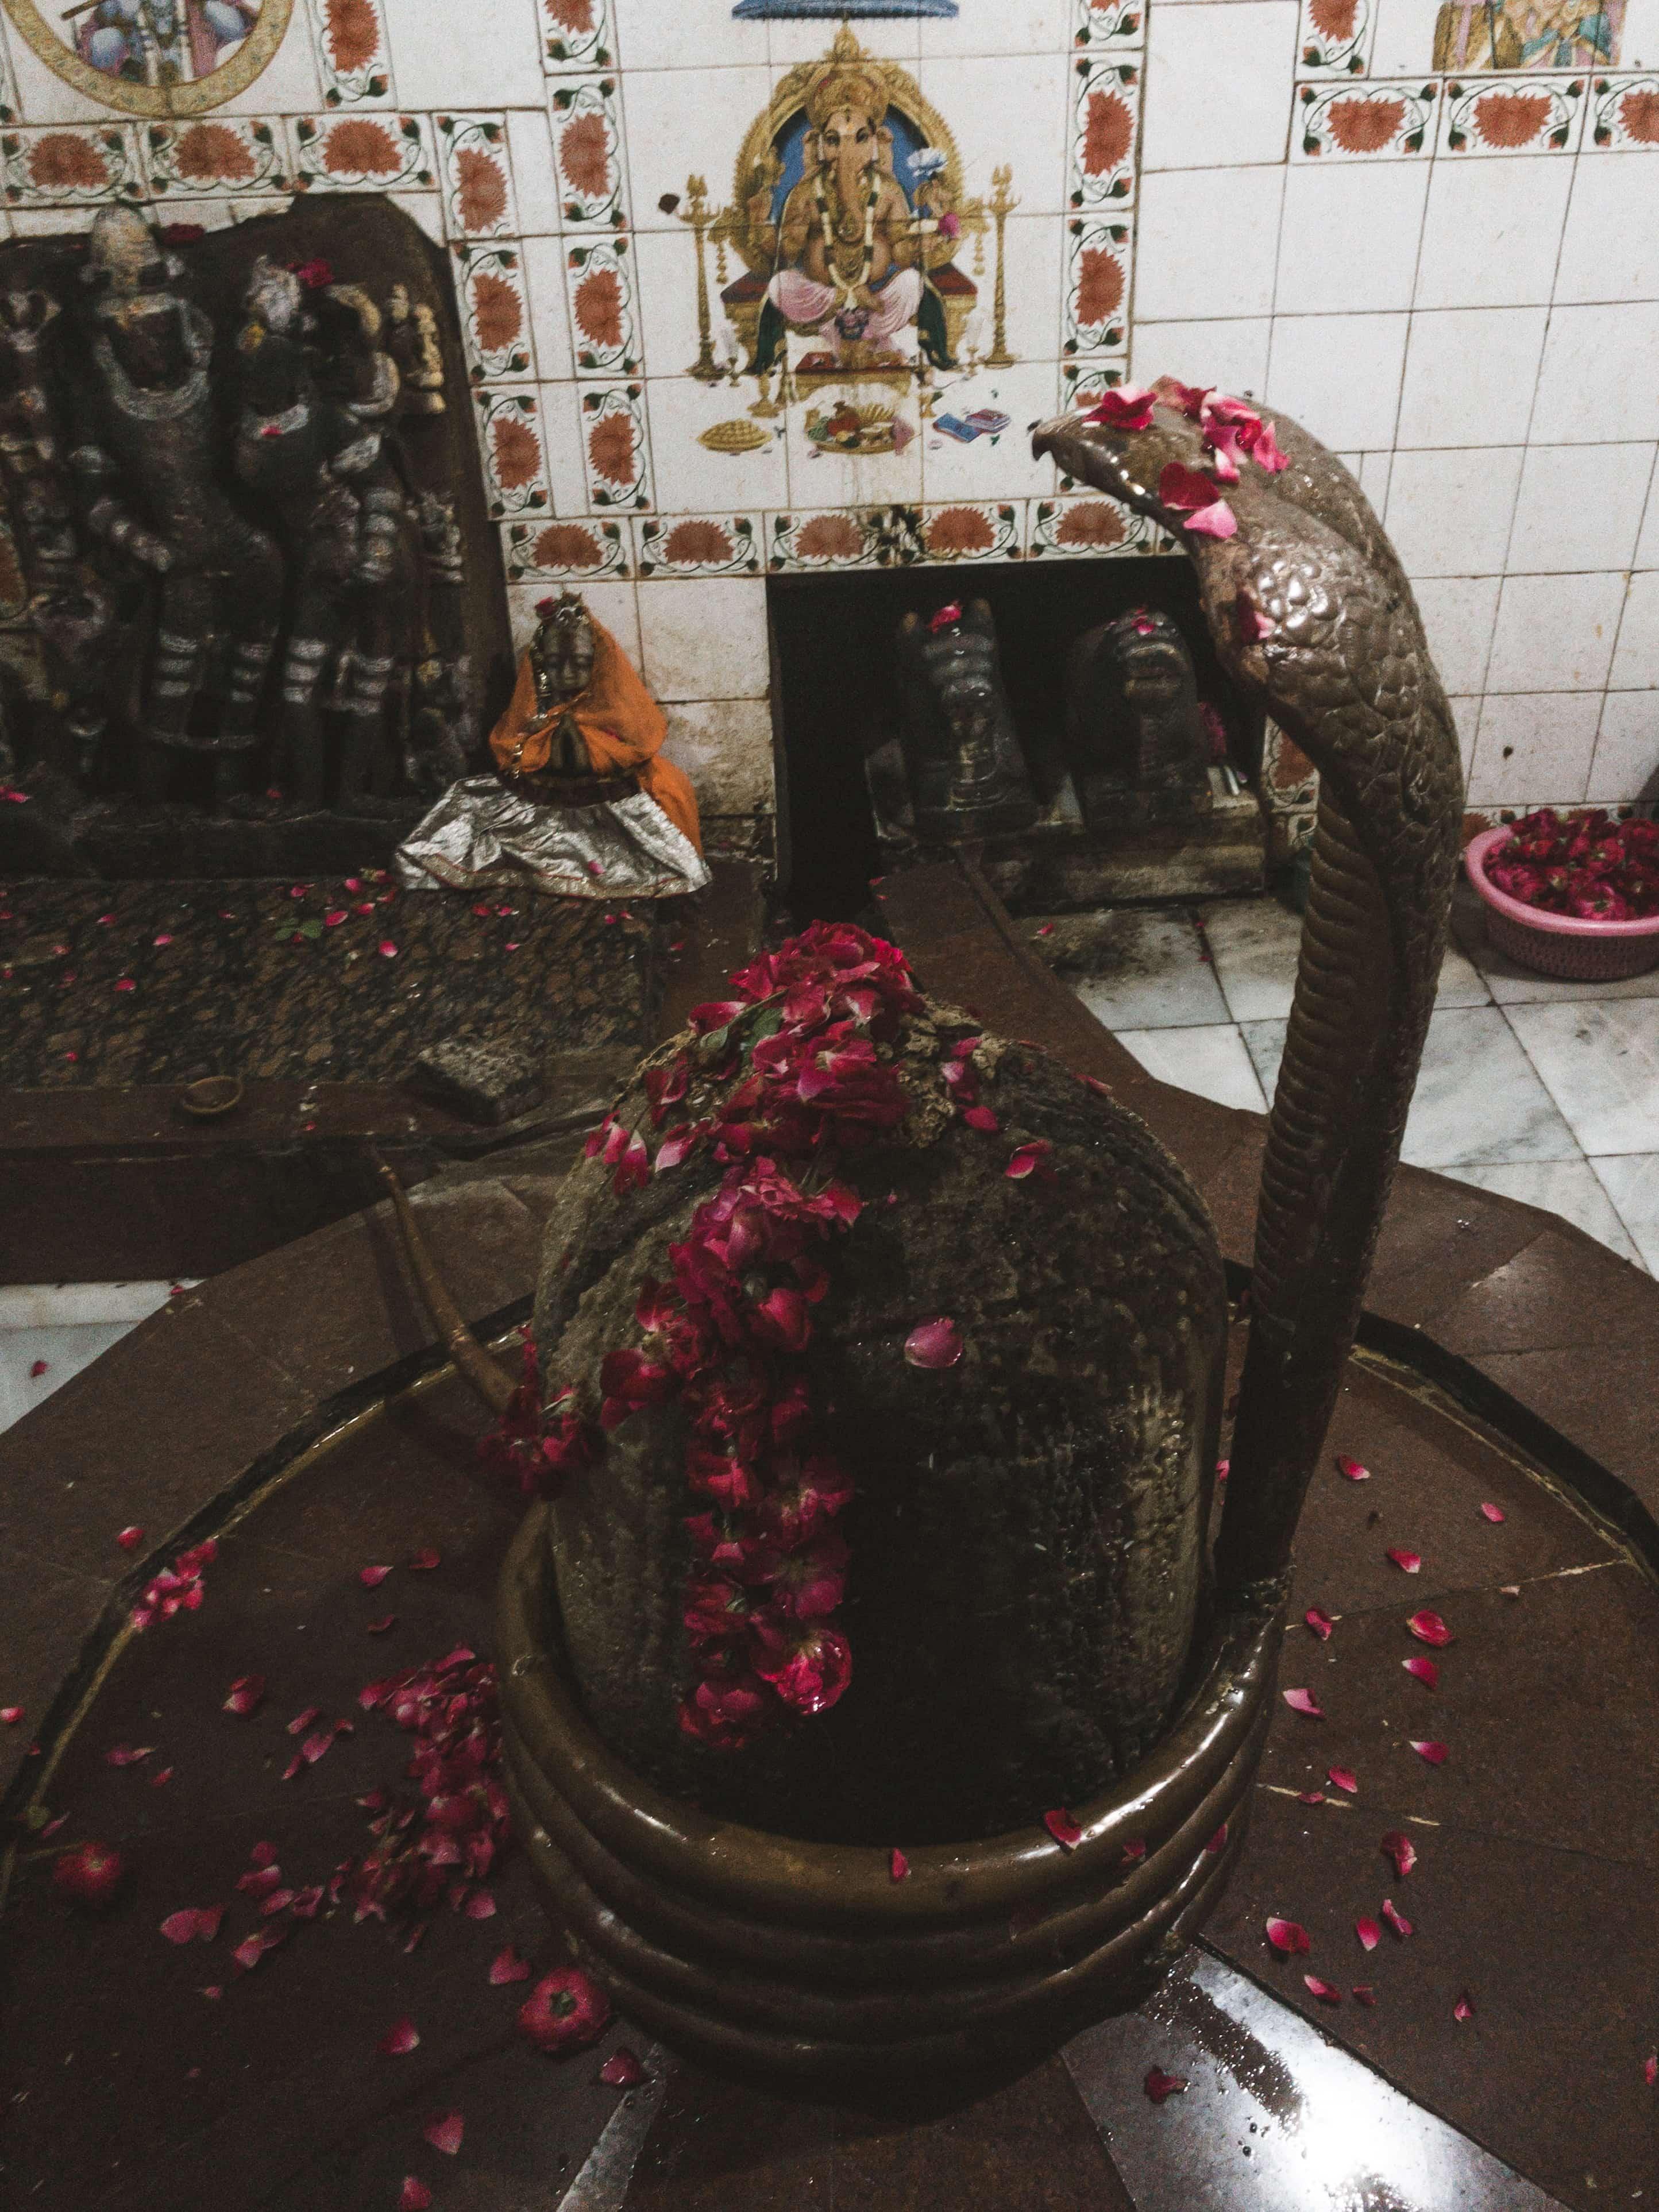 shiva lingam, thigns to do in Pushkar, pushkar travel guide